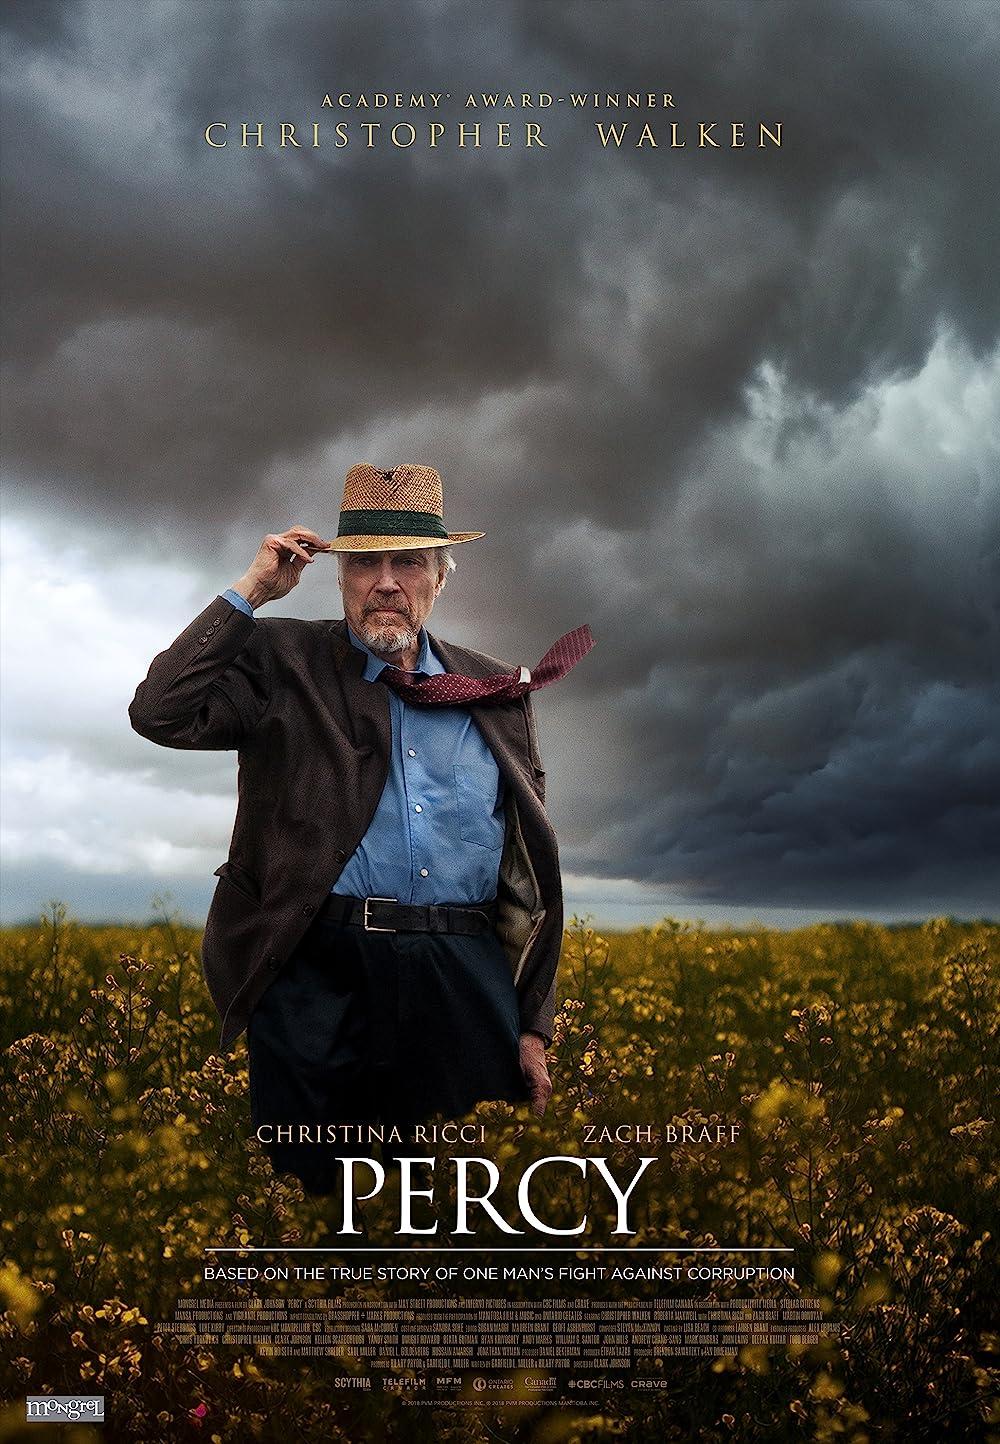 Percy Vs Goliath 2021 English 1080p HDRip 1.4GB Download